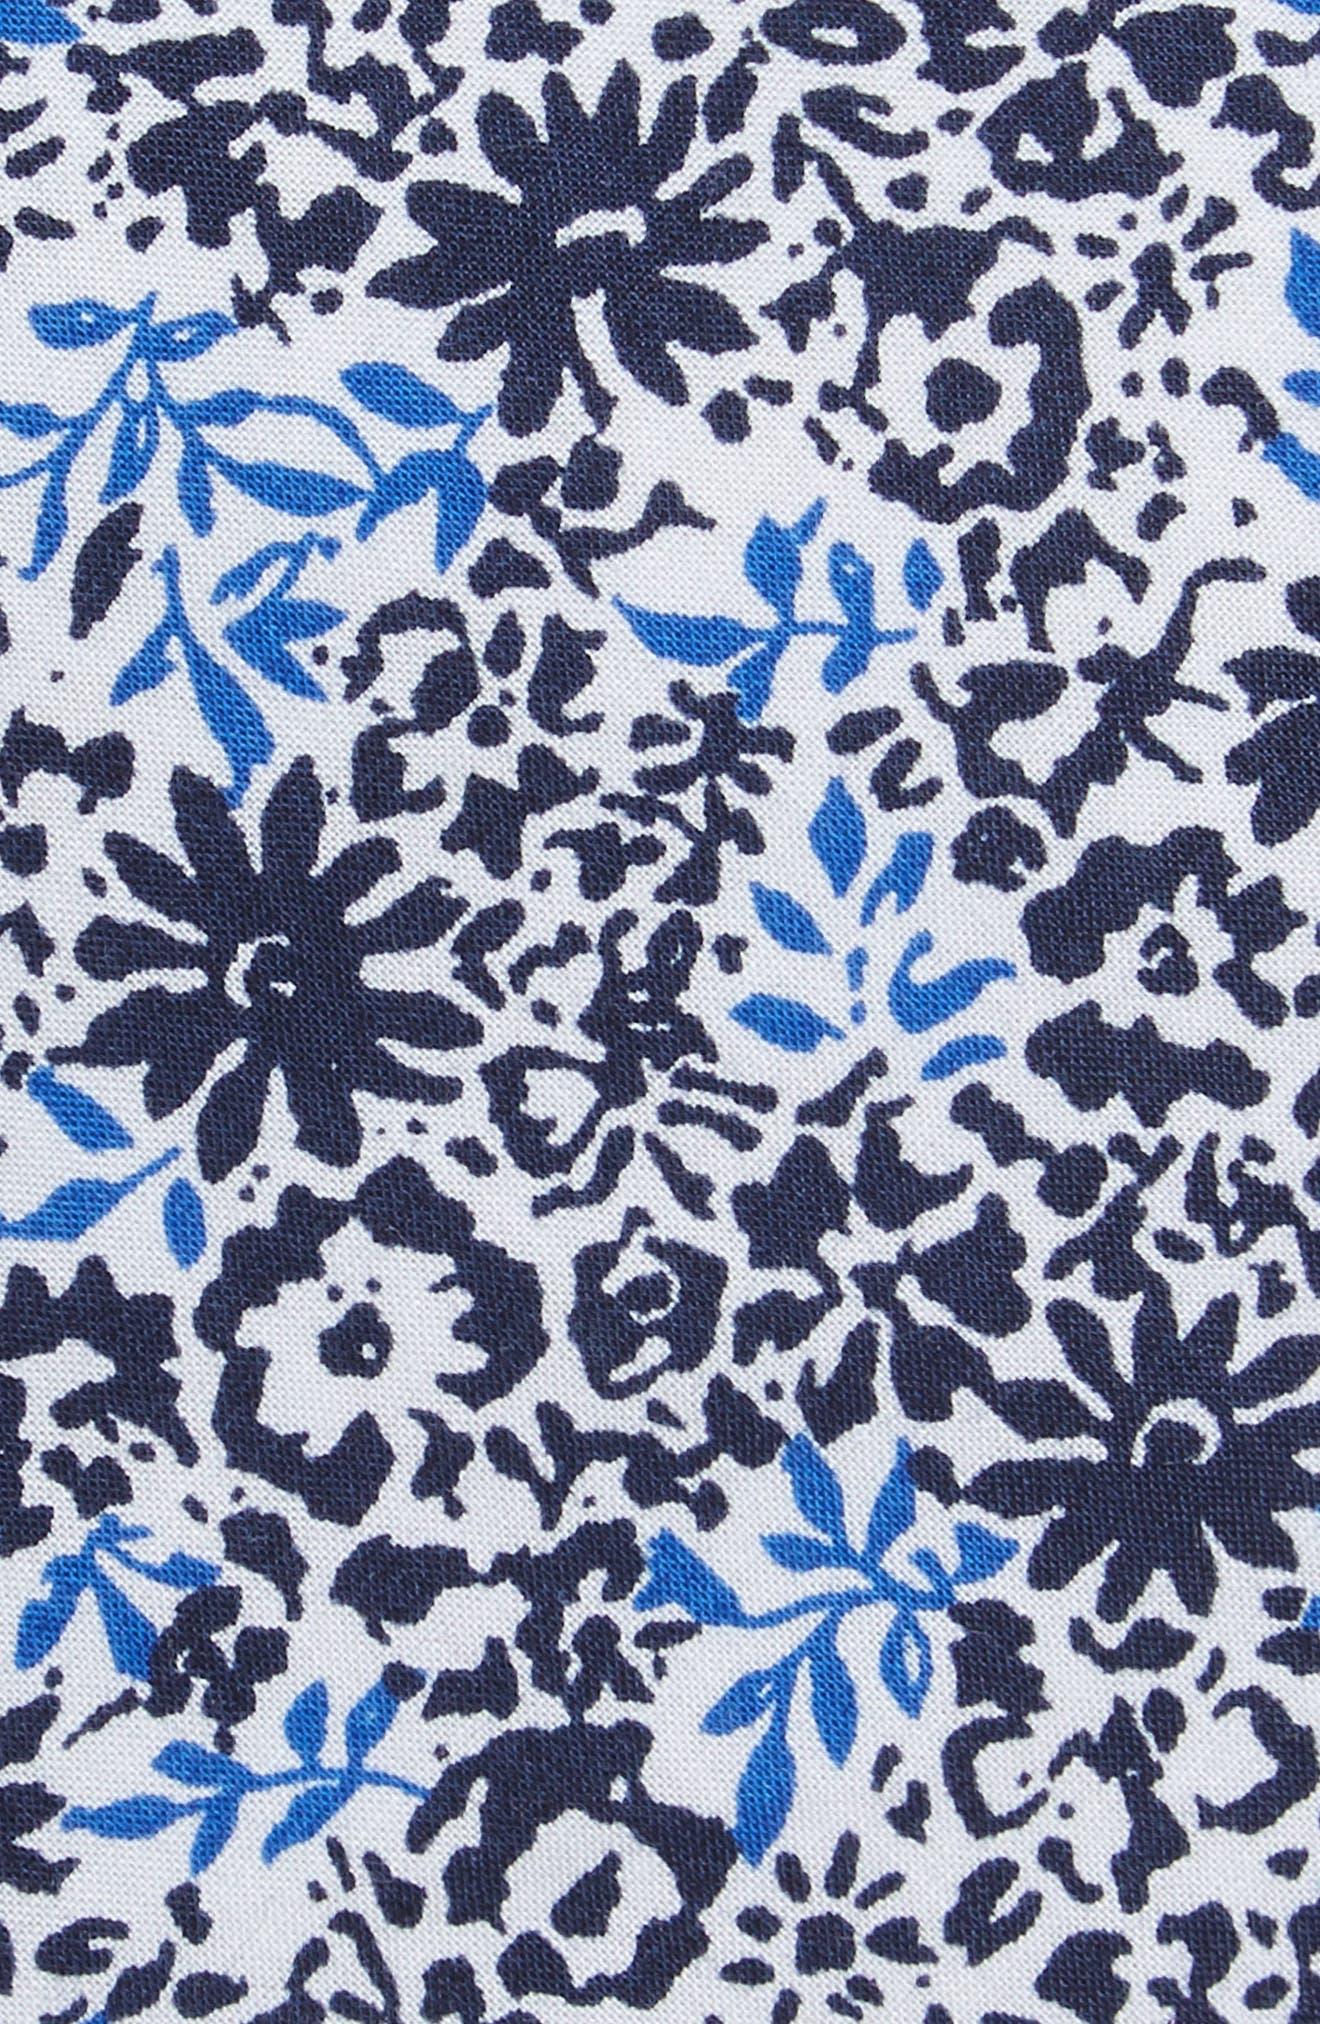 Grace Floral Print Cotton Skinny Tie,                             Alternate thumbnail 2, color,                             Navy